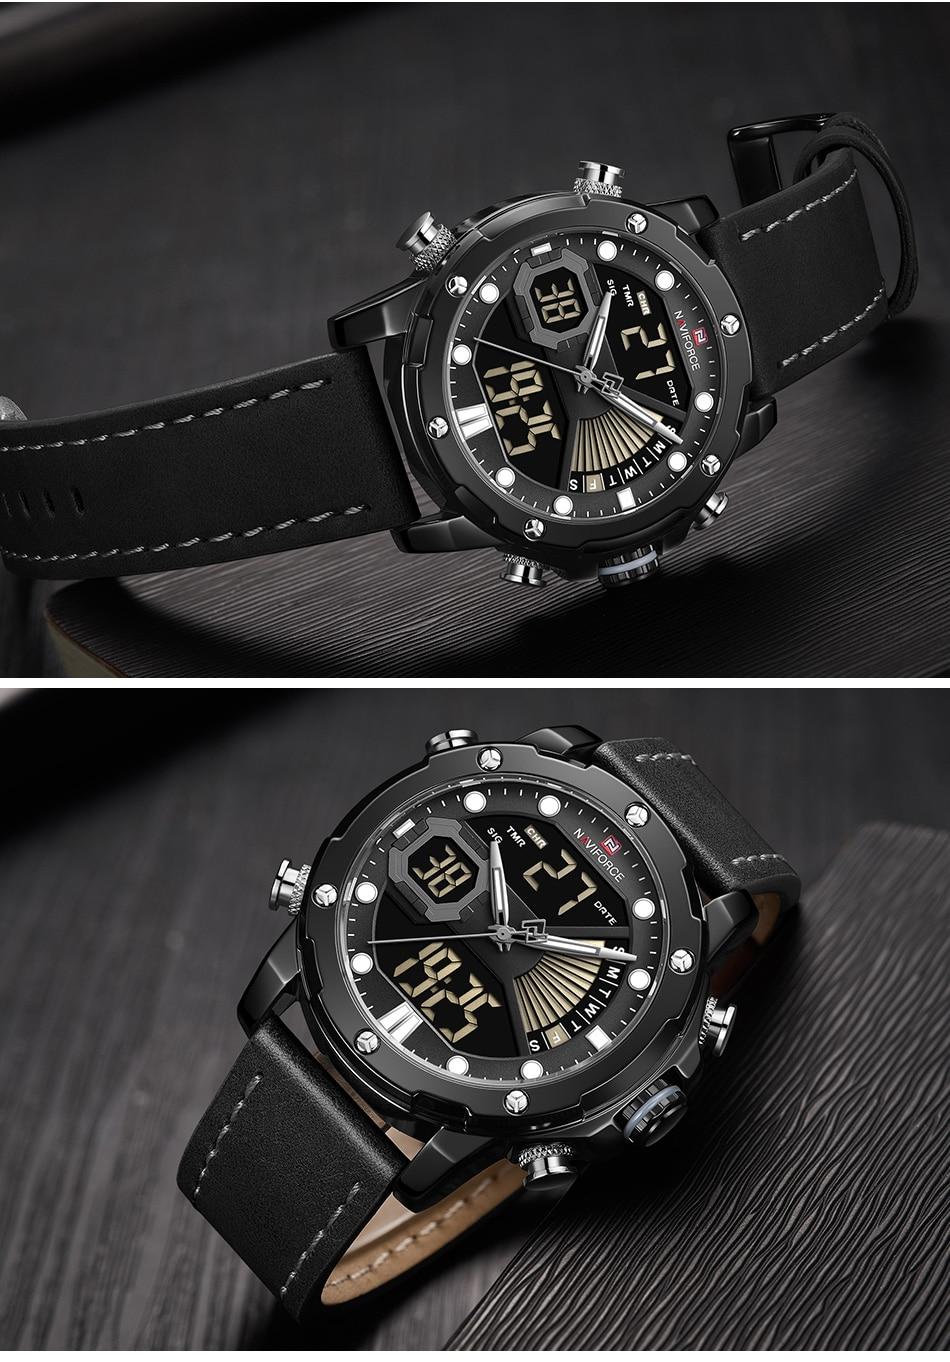 H7ebaa0bd73cc404e928fec2280413c9do NAVIFORCE Men Watch Top Luxury Brand Fashion Sports Wristwatch